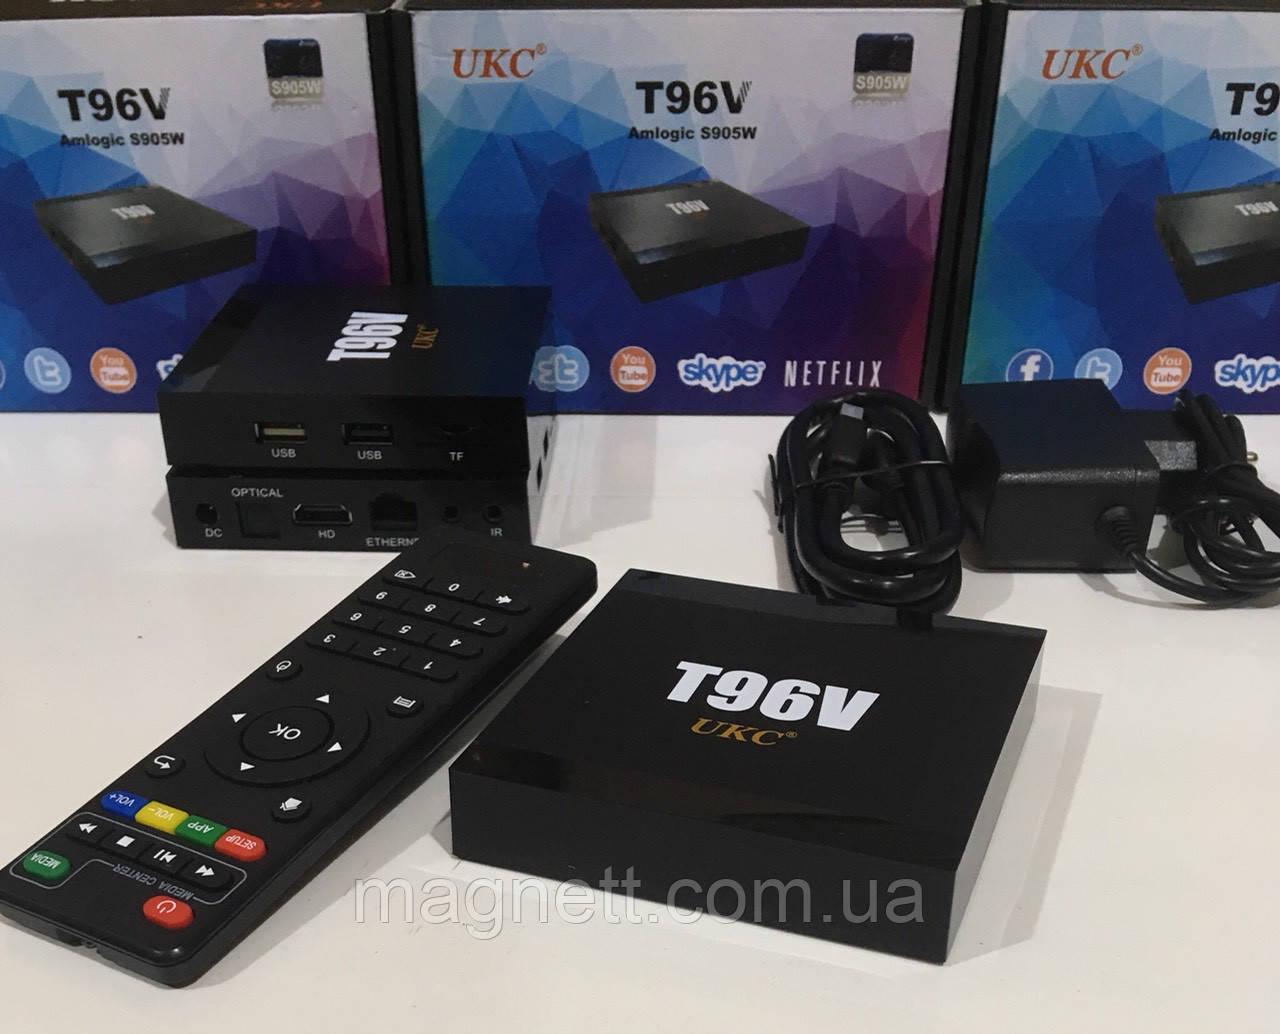 Смарт ТВ-приставка UKC T96V (2GB\16GB)